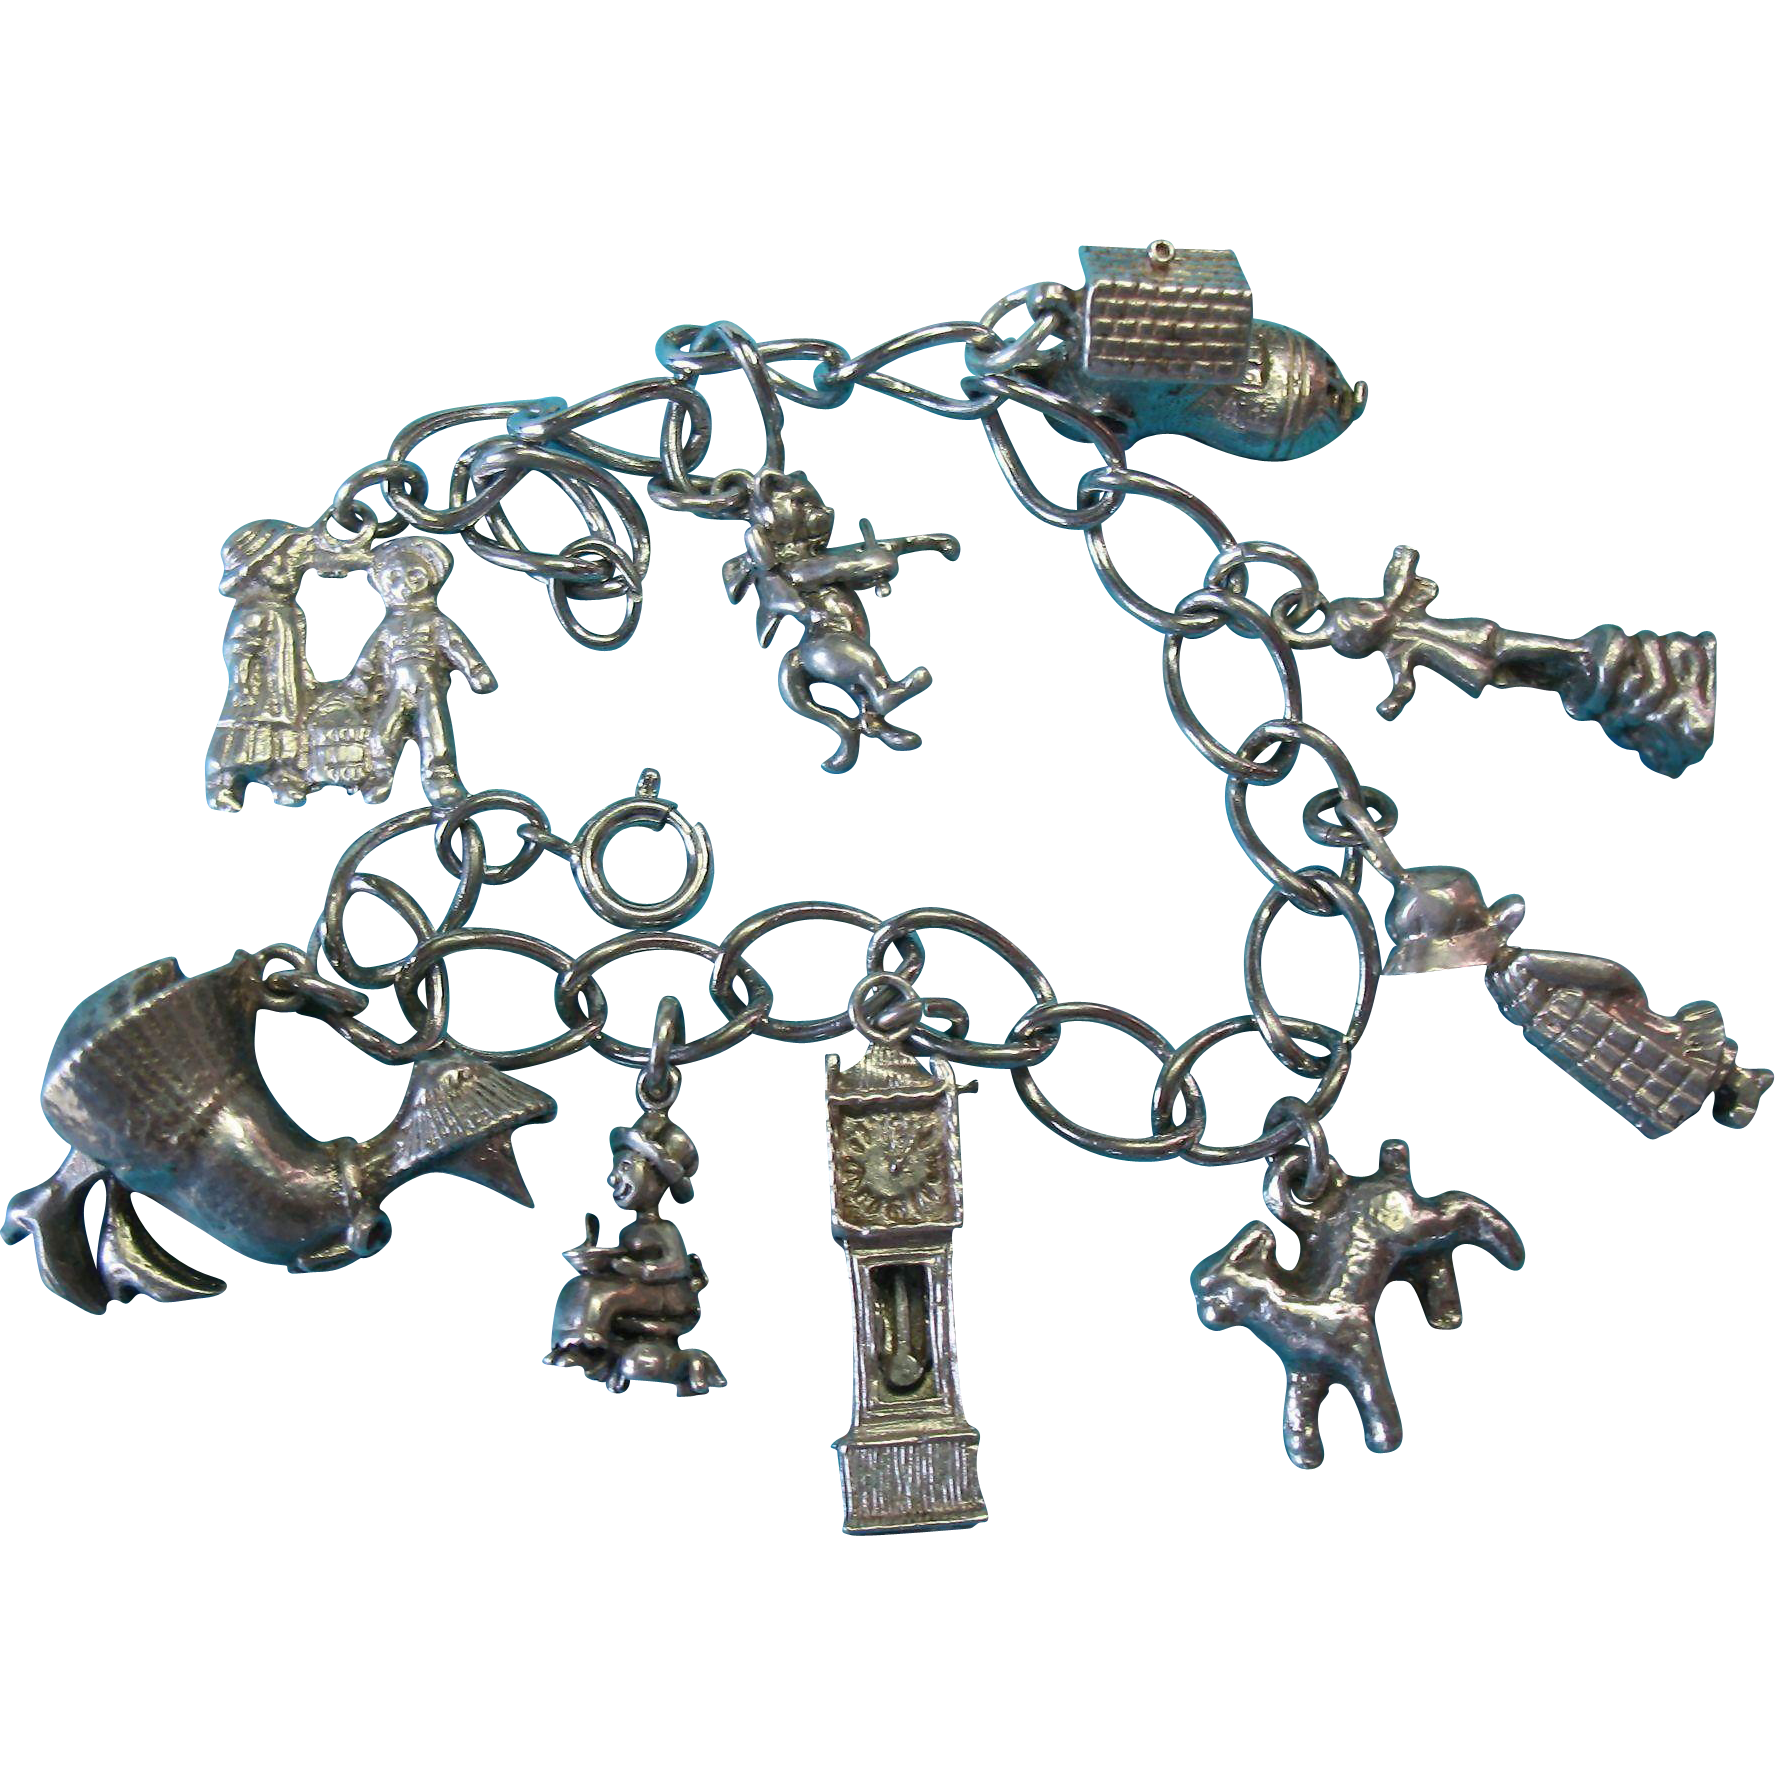 Vintage Sterling Silver Nursery Rhyme Charm Bracelet